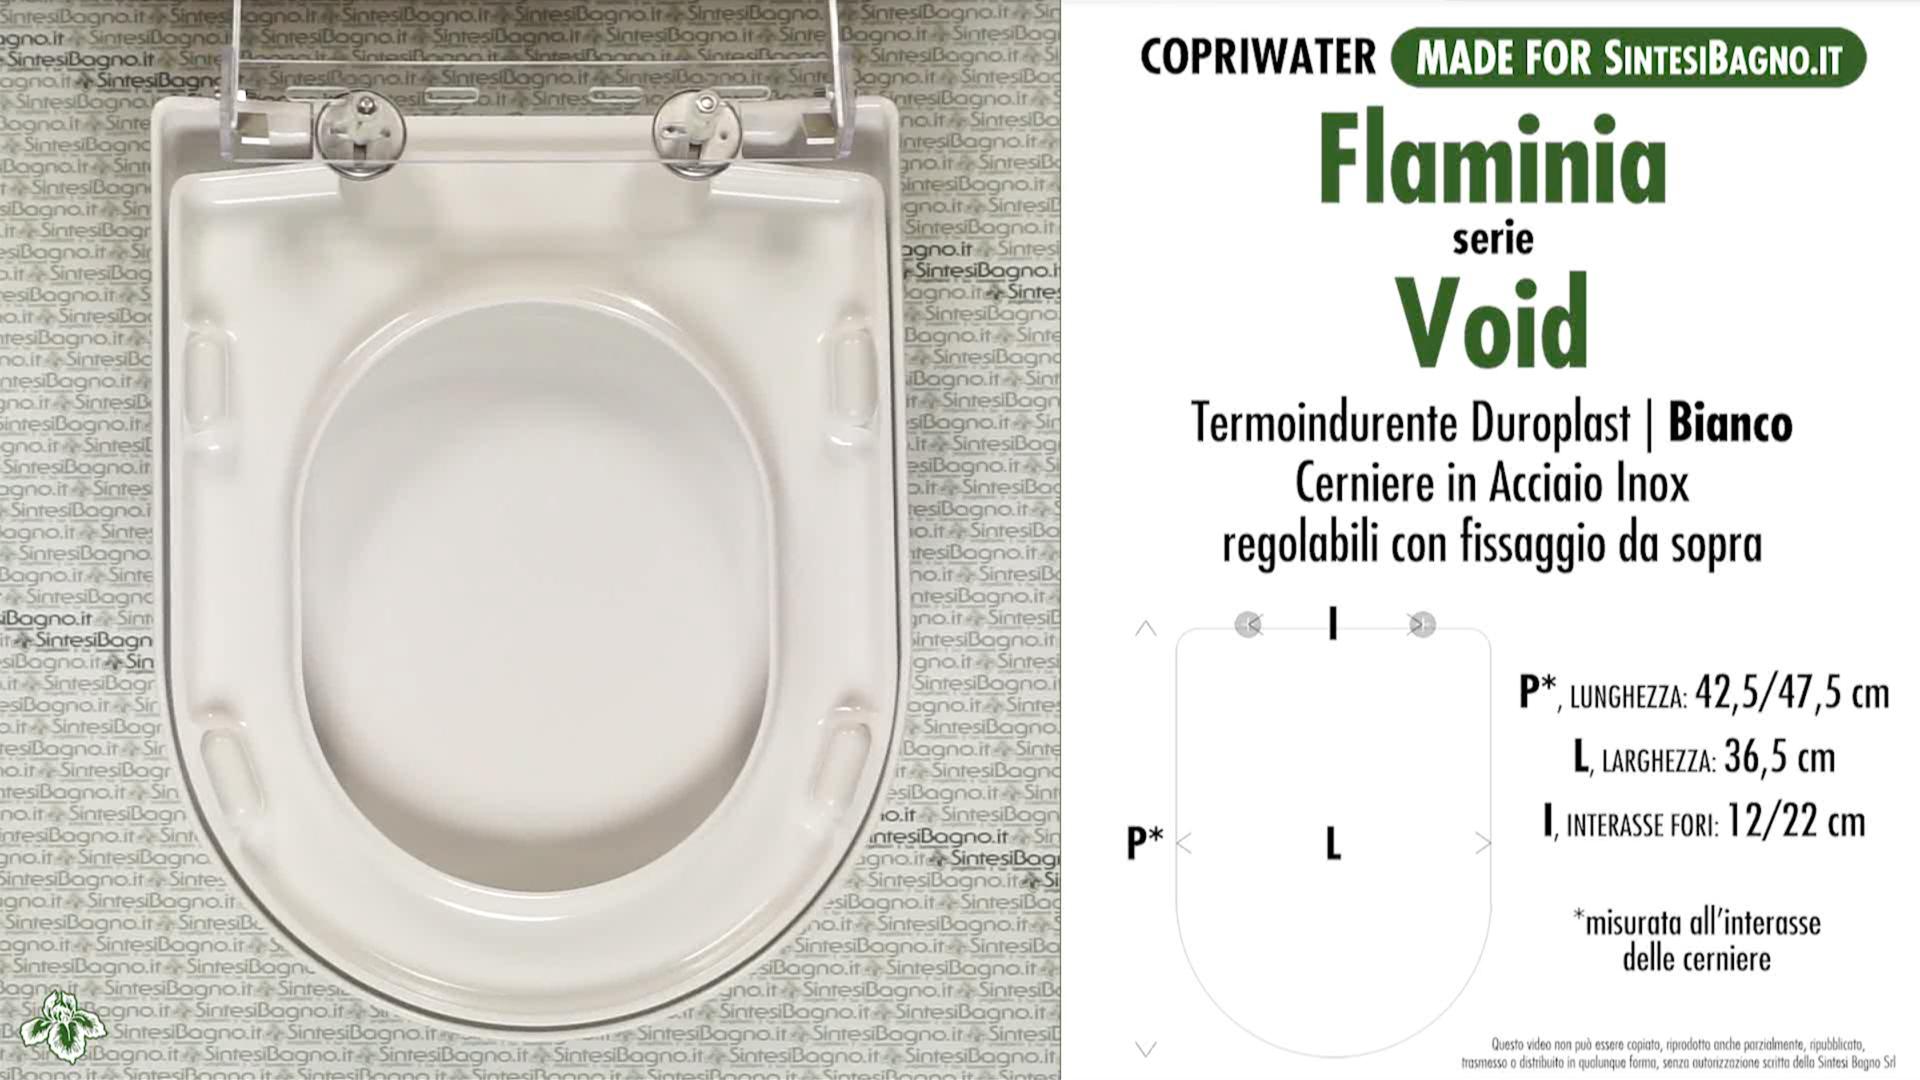 SCHEDA TECNICA MISURE copriwater FLAMINIA VOID